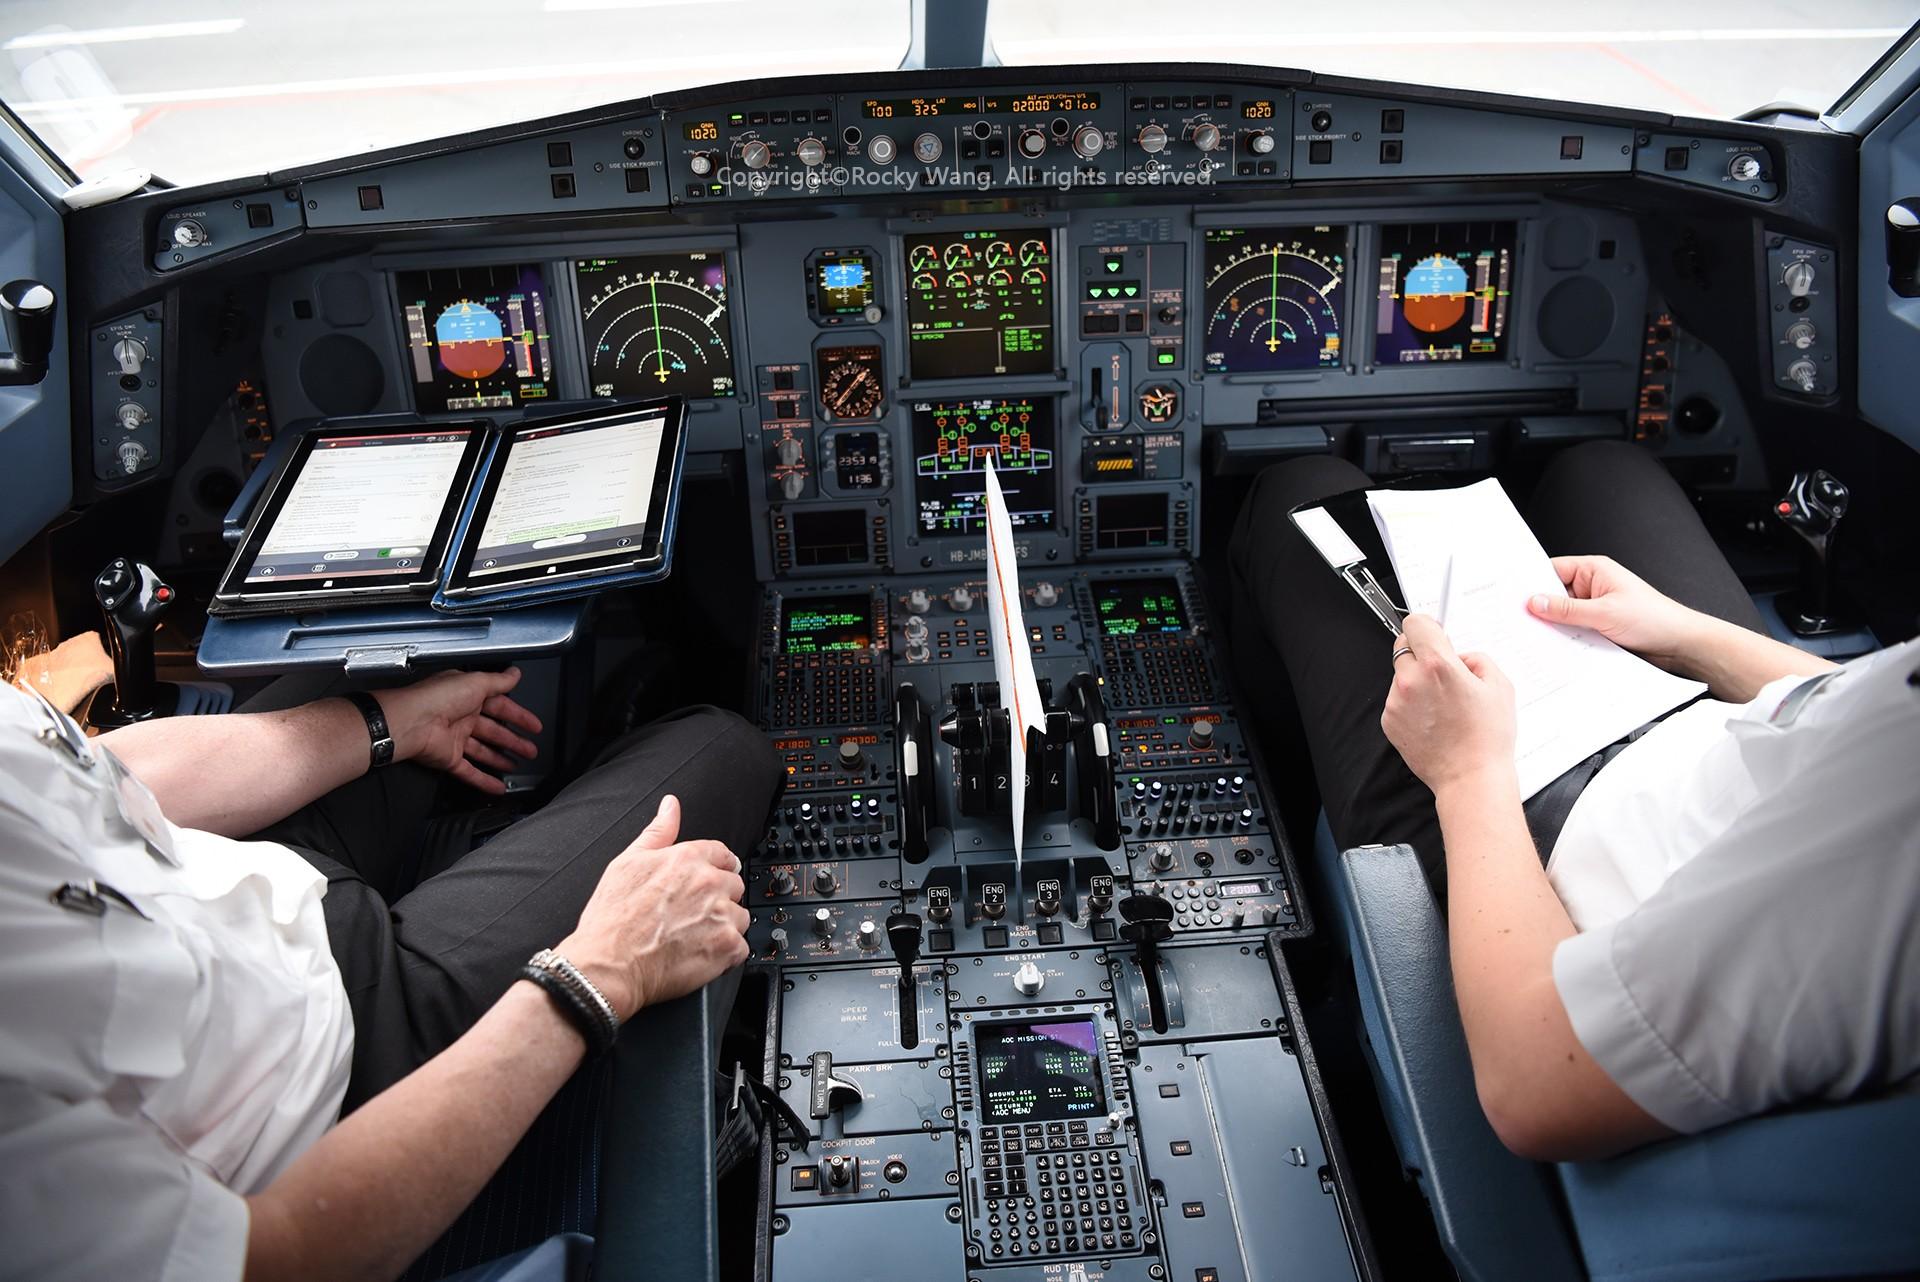 Re:[原创]简易版游记,纪念一次30段的环球飞行和一些碎碎念 AIRBUS A340-313 HB-JMB 中国上海浦东国际机场